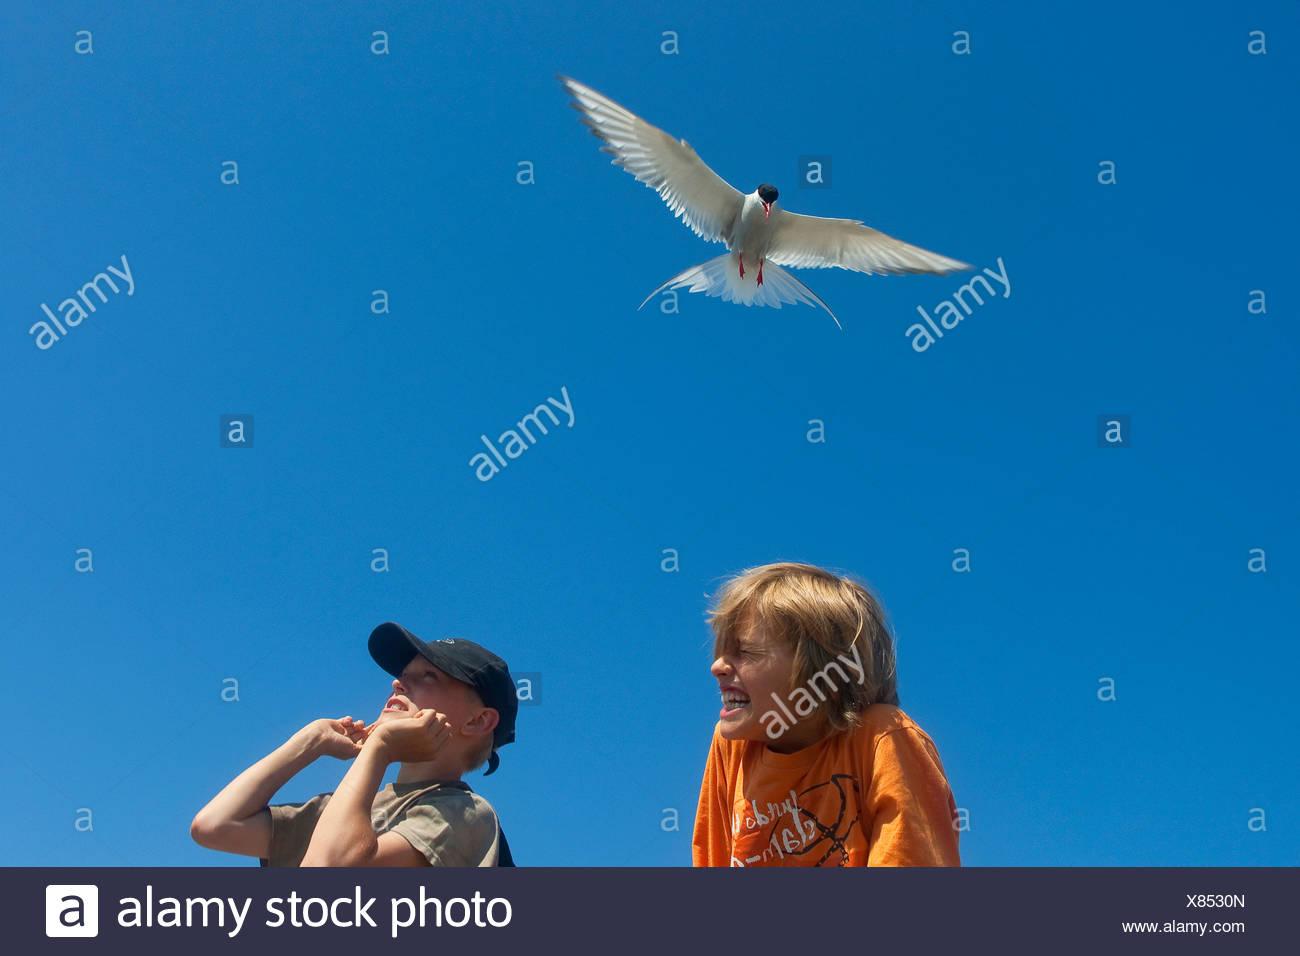 arctic tern (Sterna paradisaea), attacking children, Germany - Stock Image